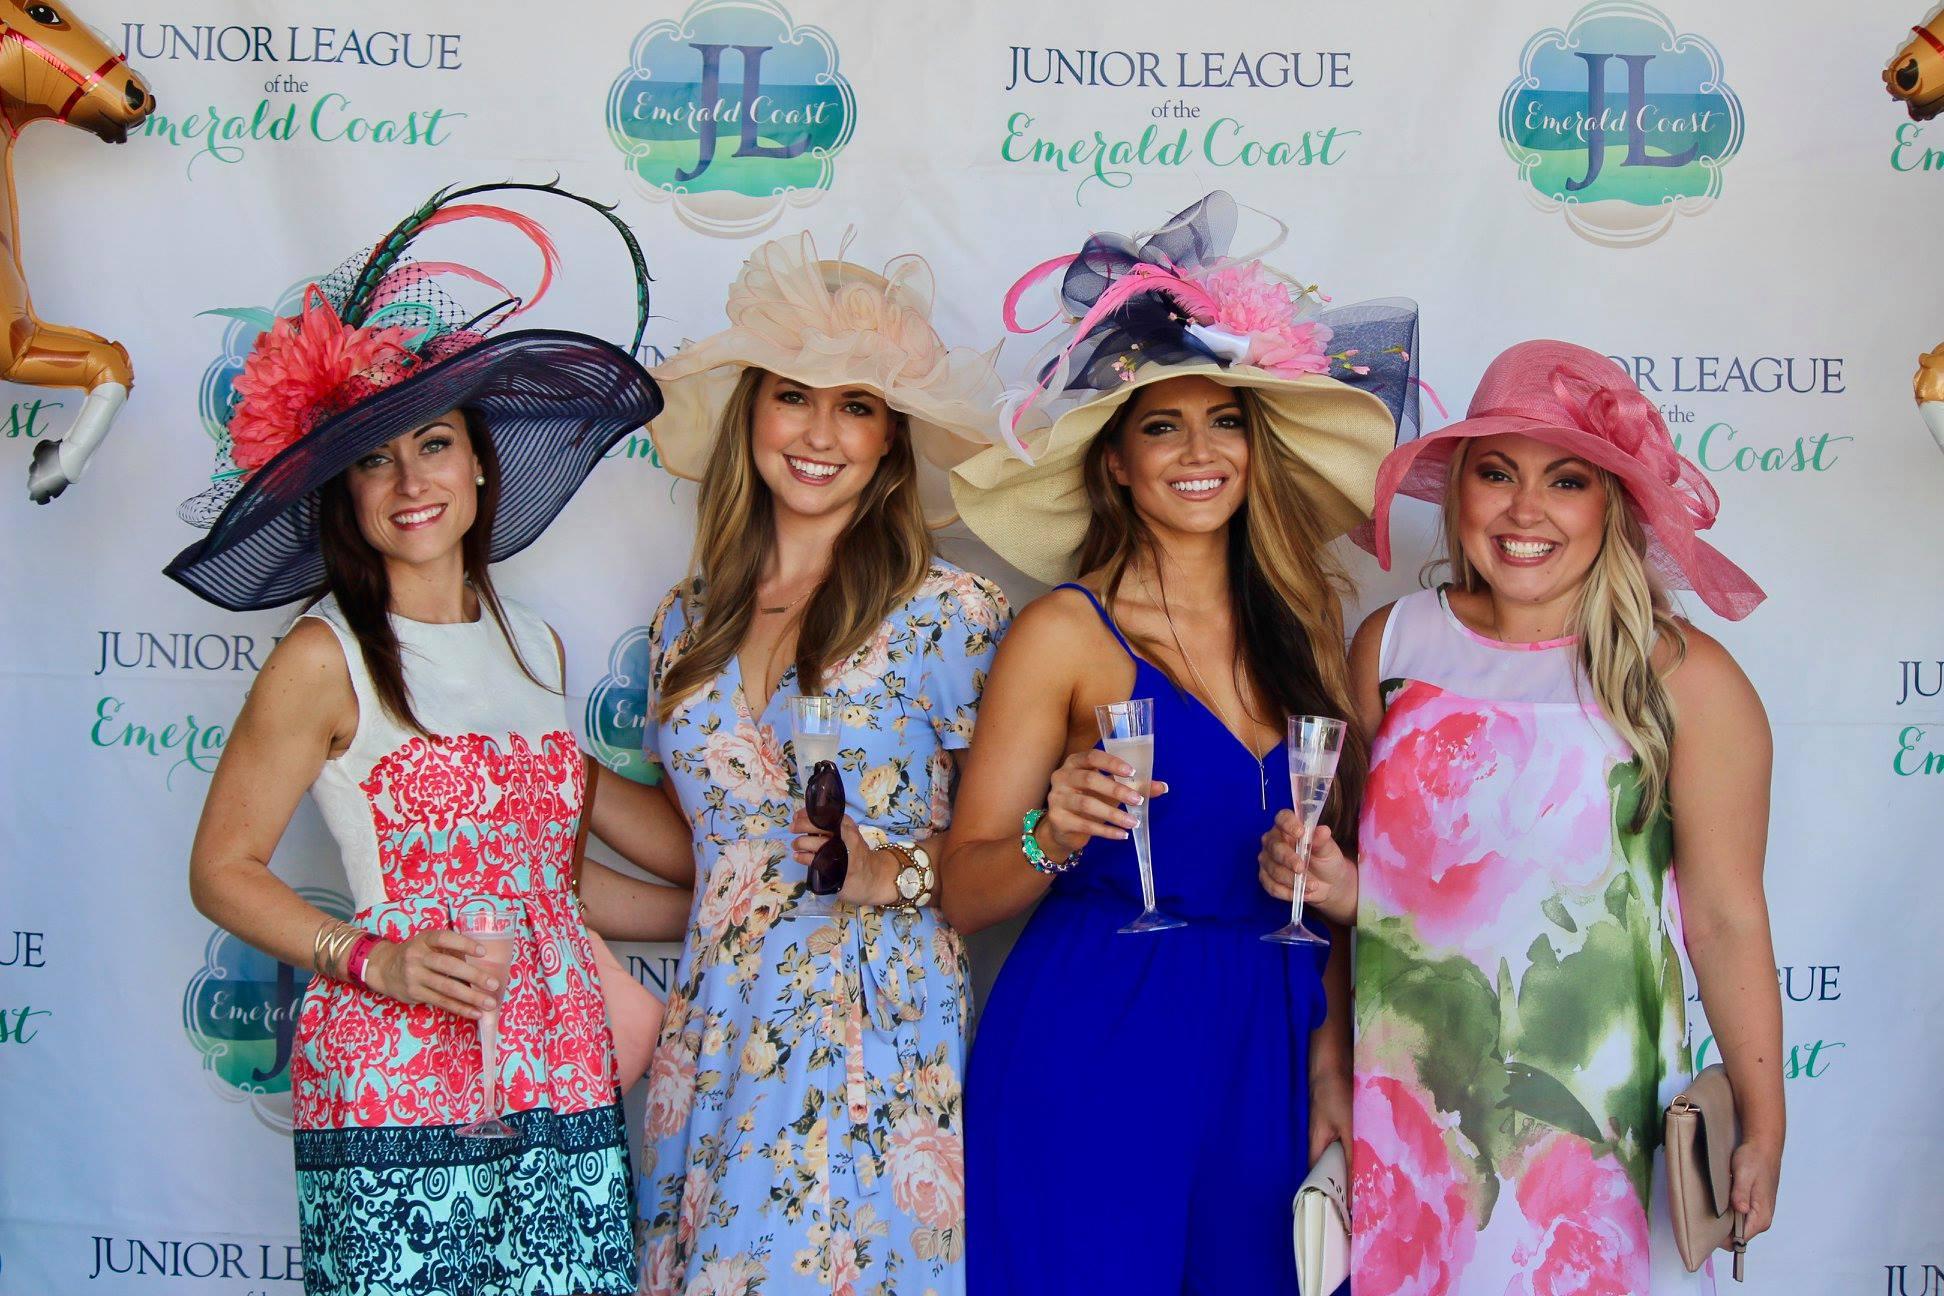 Junior League of the Emerald Coast raises over $15,000